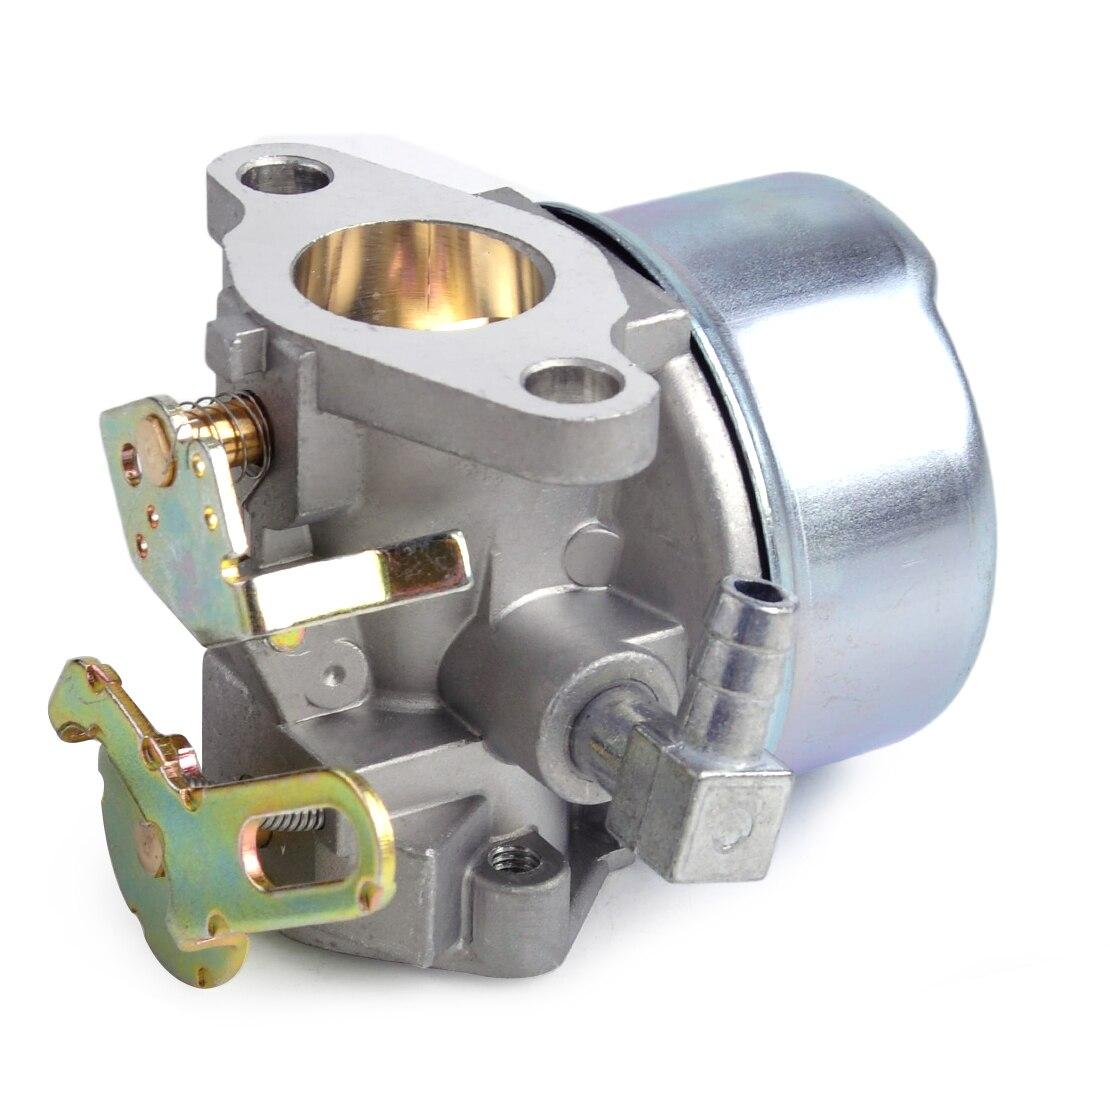 Letaosk metal carburador carb acessórios apto para tecumseh hsk40 hsk50 hs50 lh195sp 5hp 640084a 632107